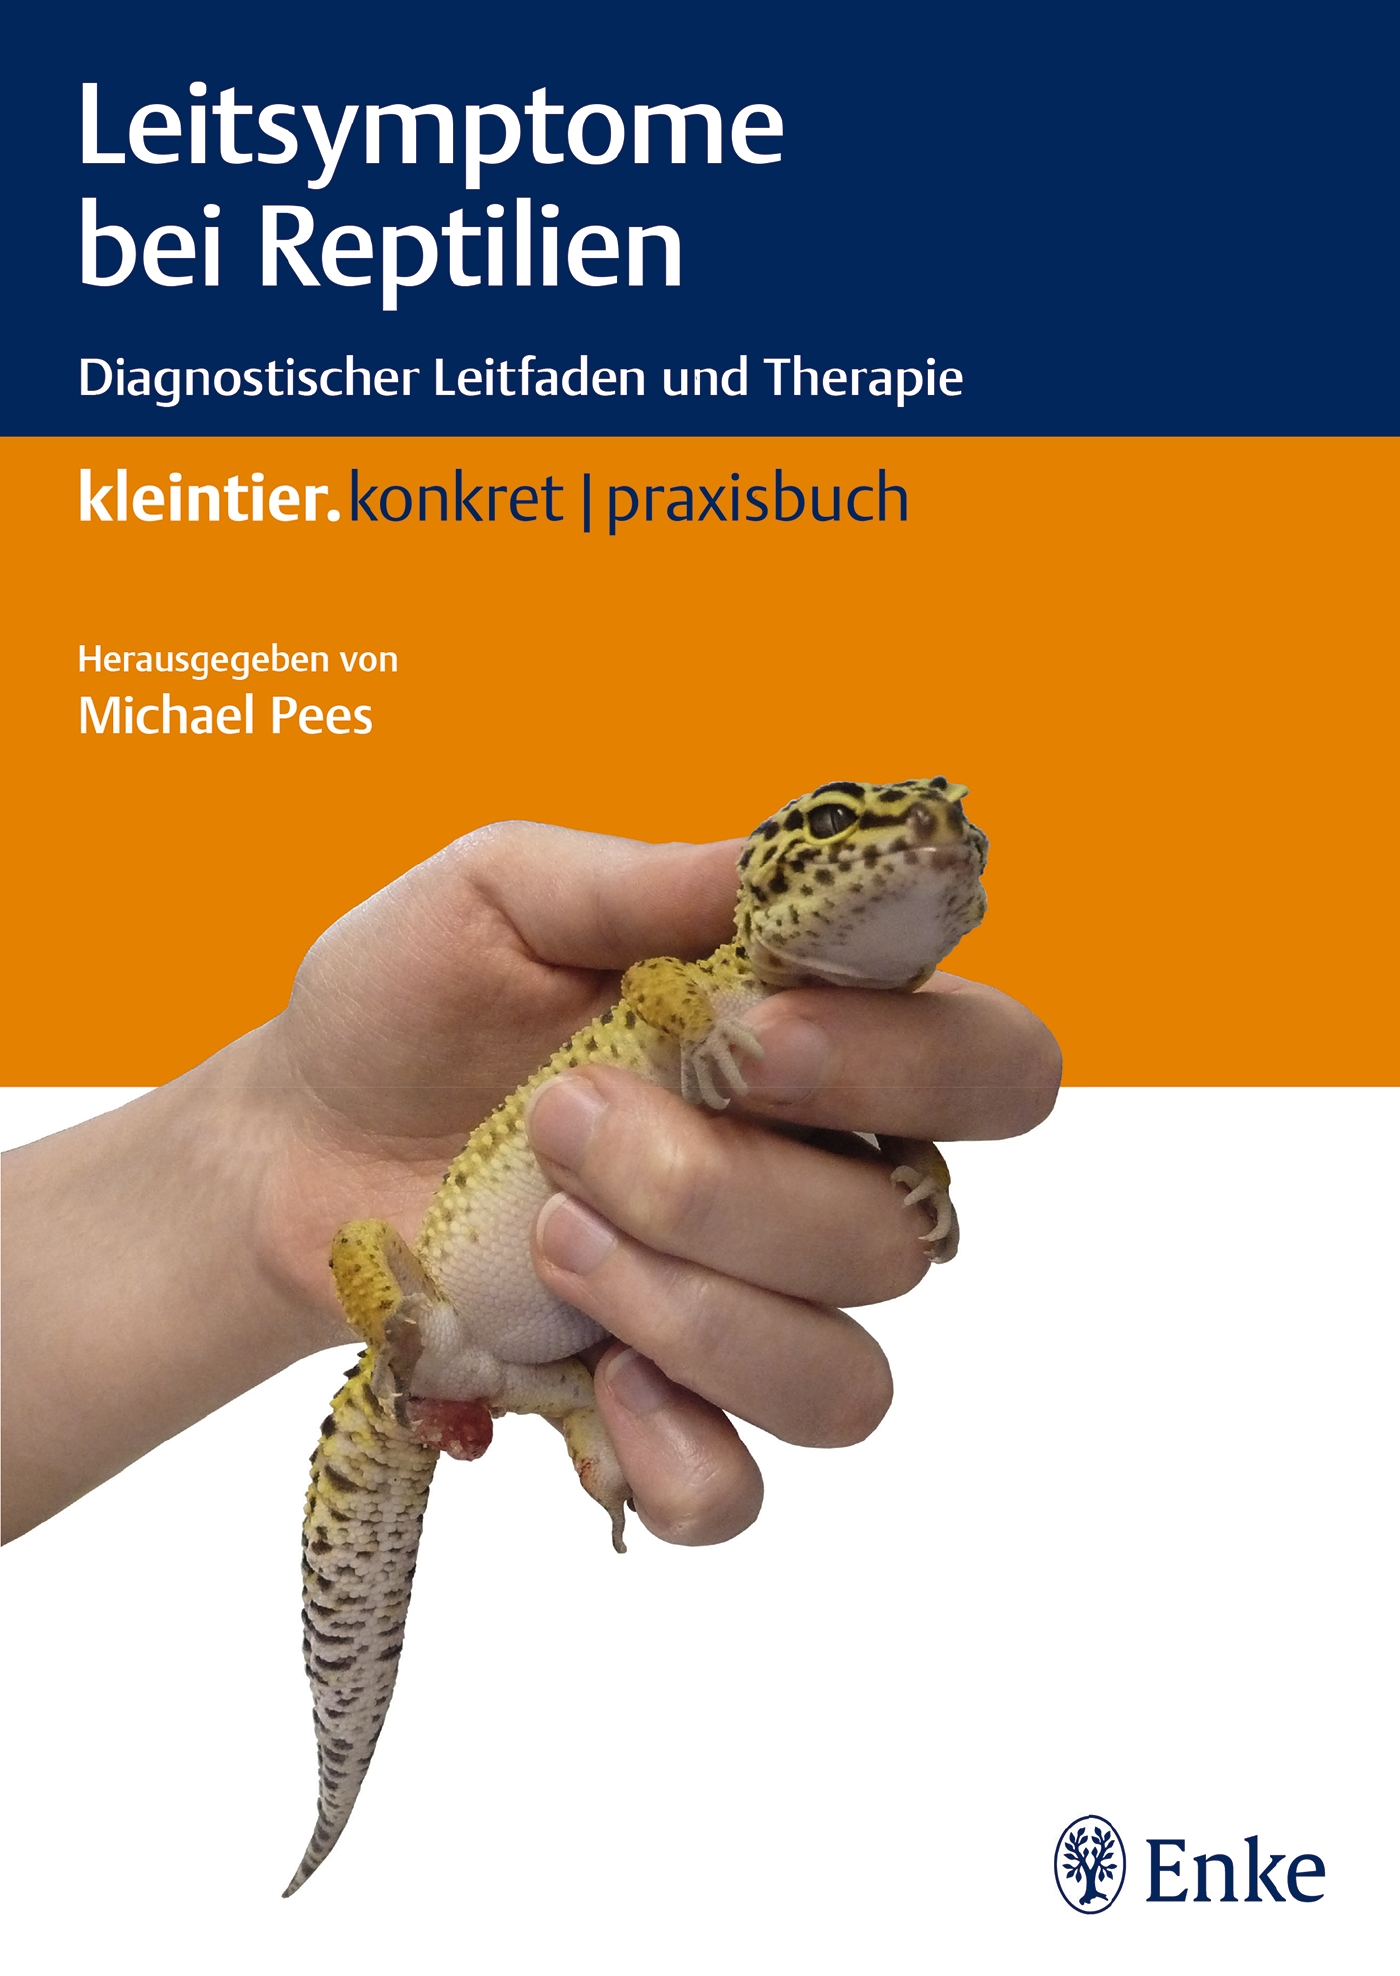 Leitsymptome bei Reptilien